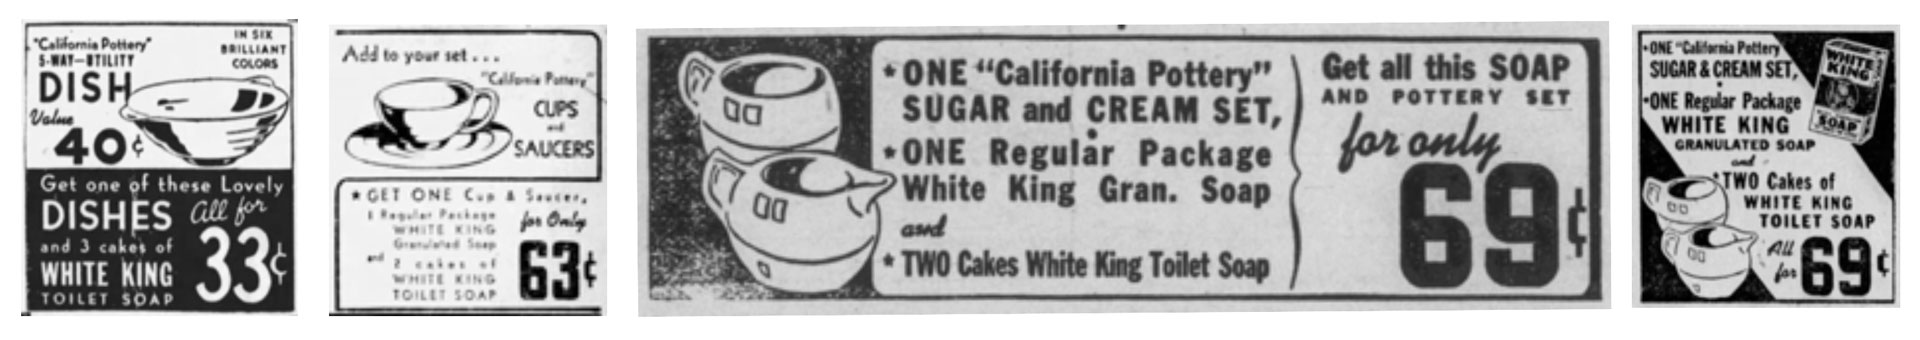 QwkDog White King Soap Metlox Display Ads